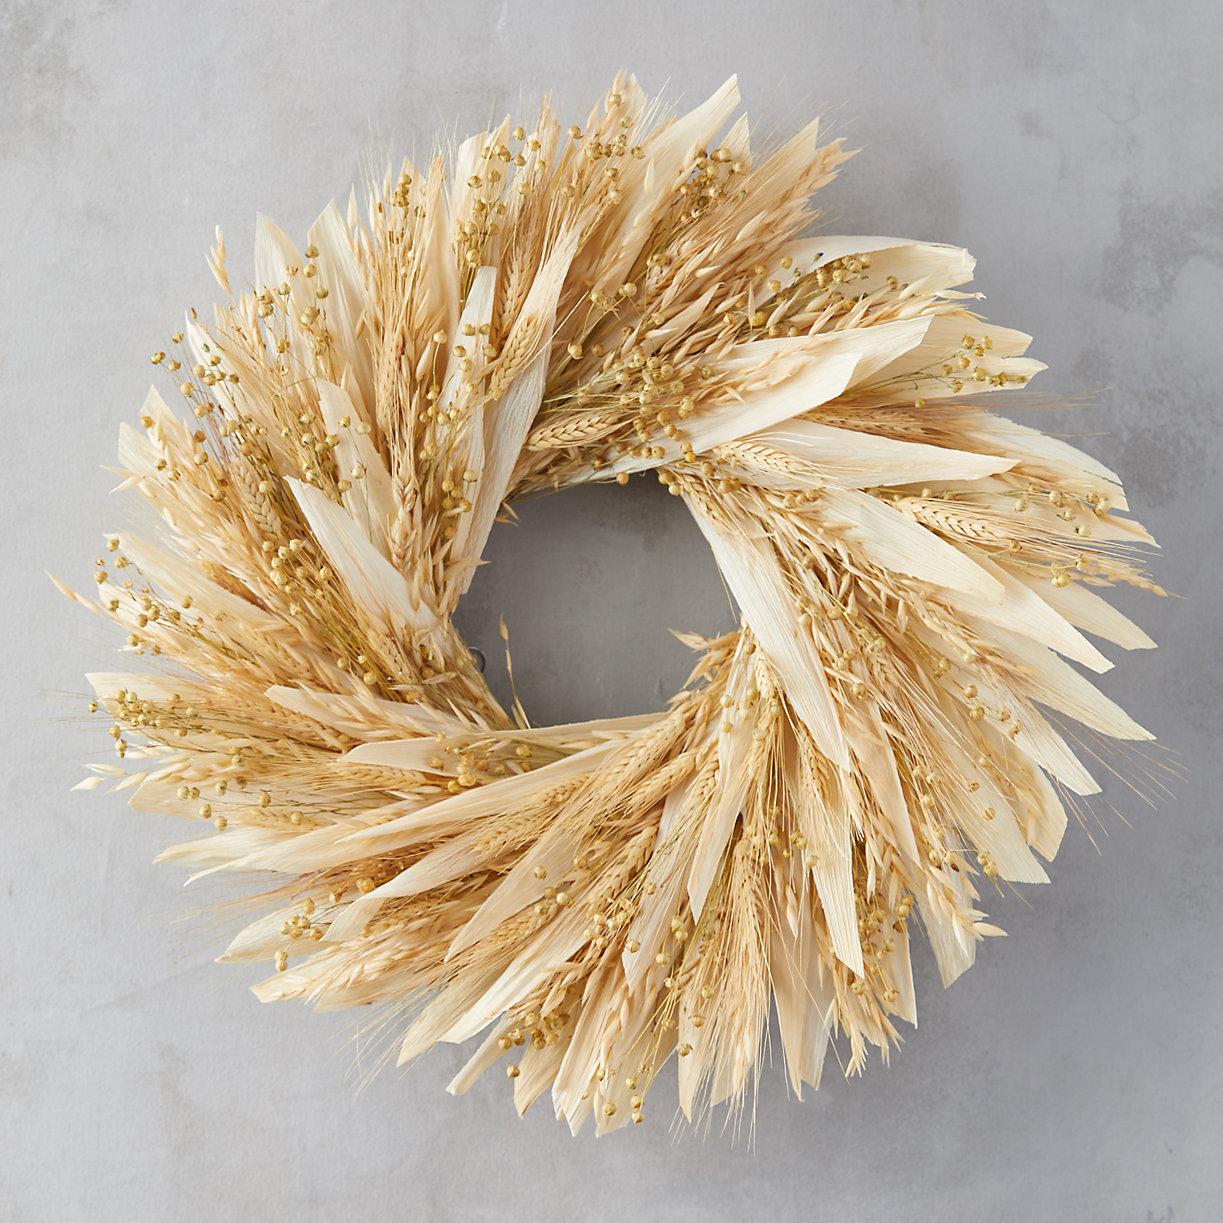 Flax + Wheat Wreath